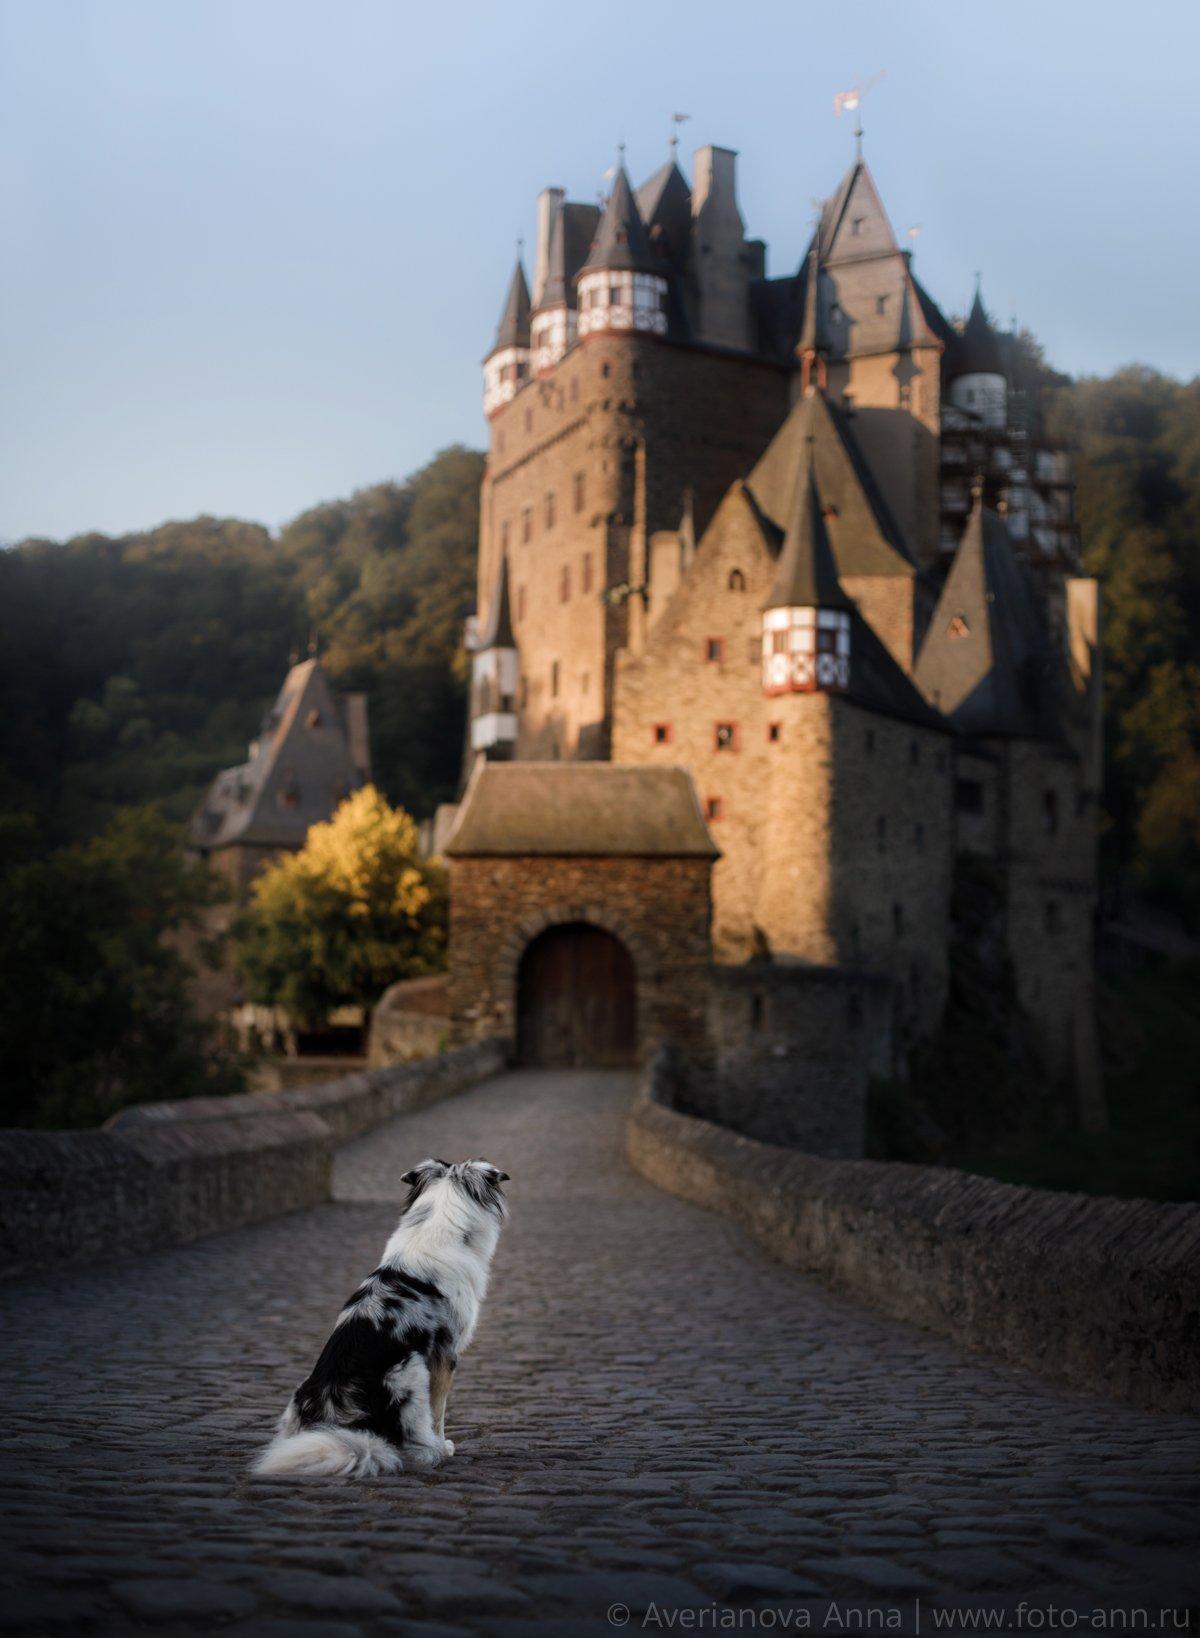 собака, замок, Анна Аверьянова